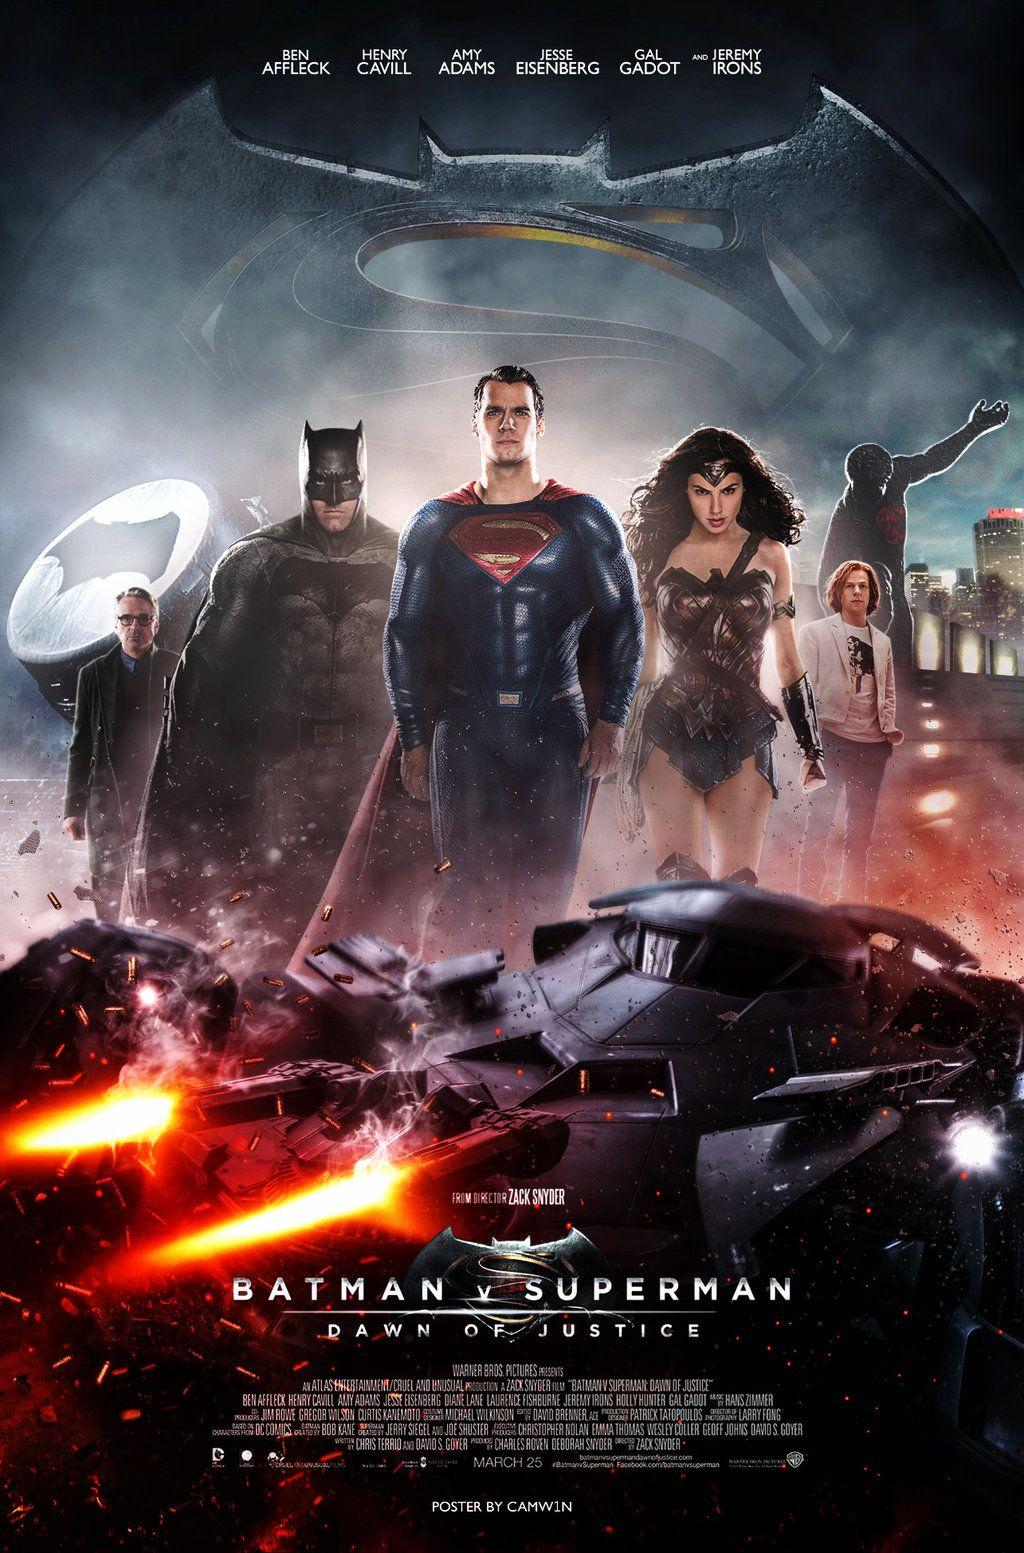 Batman V Superman 2016 Theatrical Poster Batman V Superman Dawn Of Justice Batman Vs Superman Batman V Superman Poster